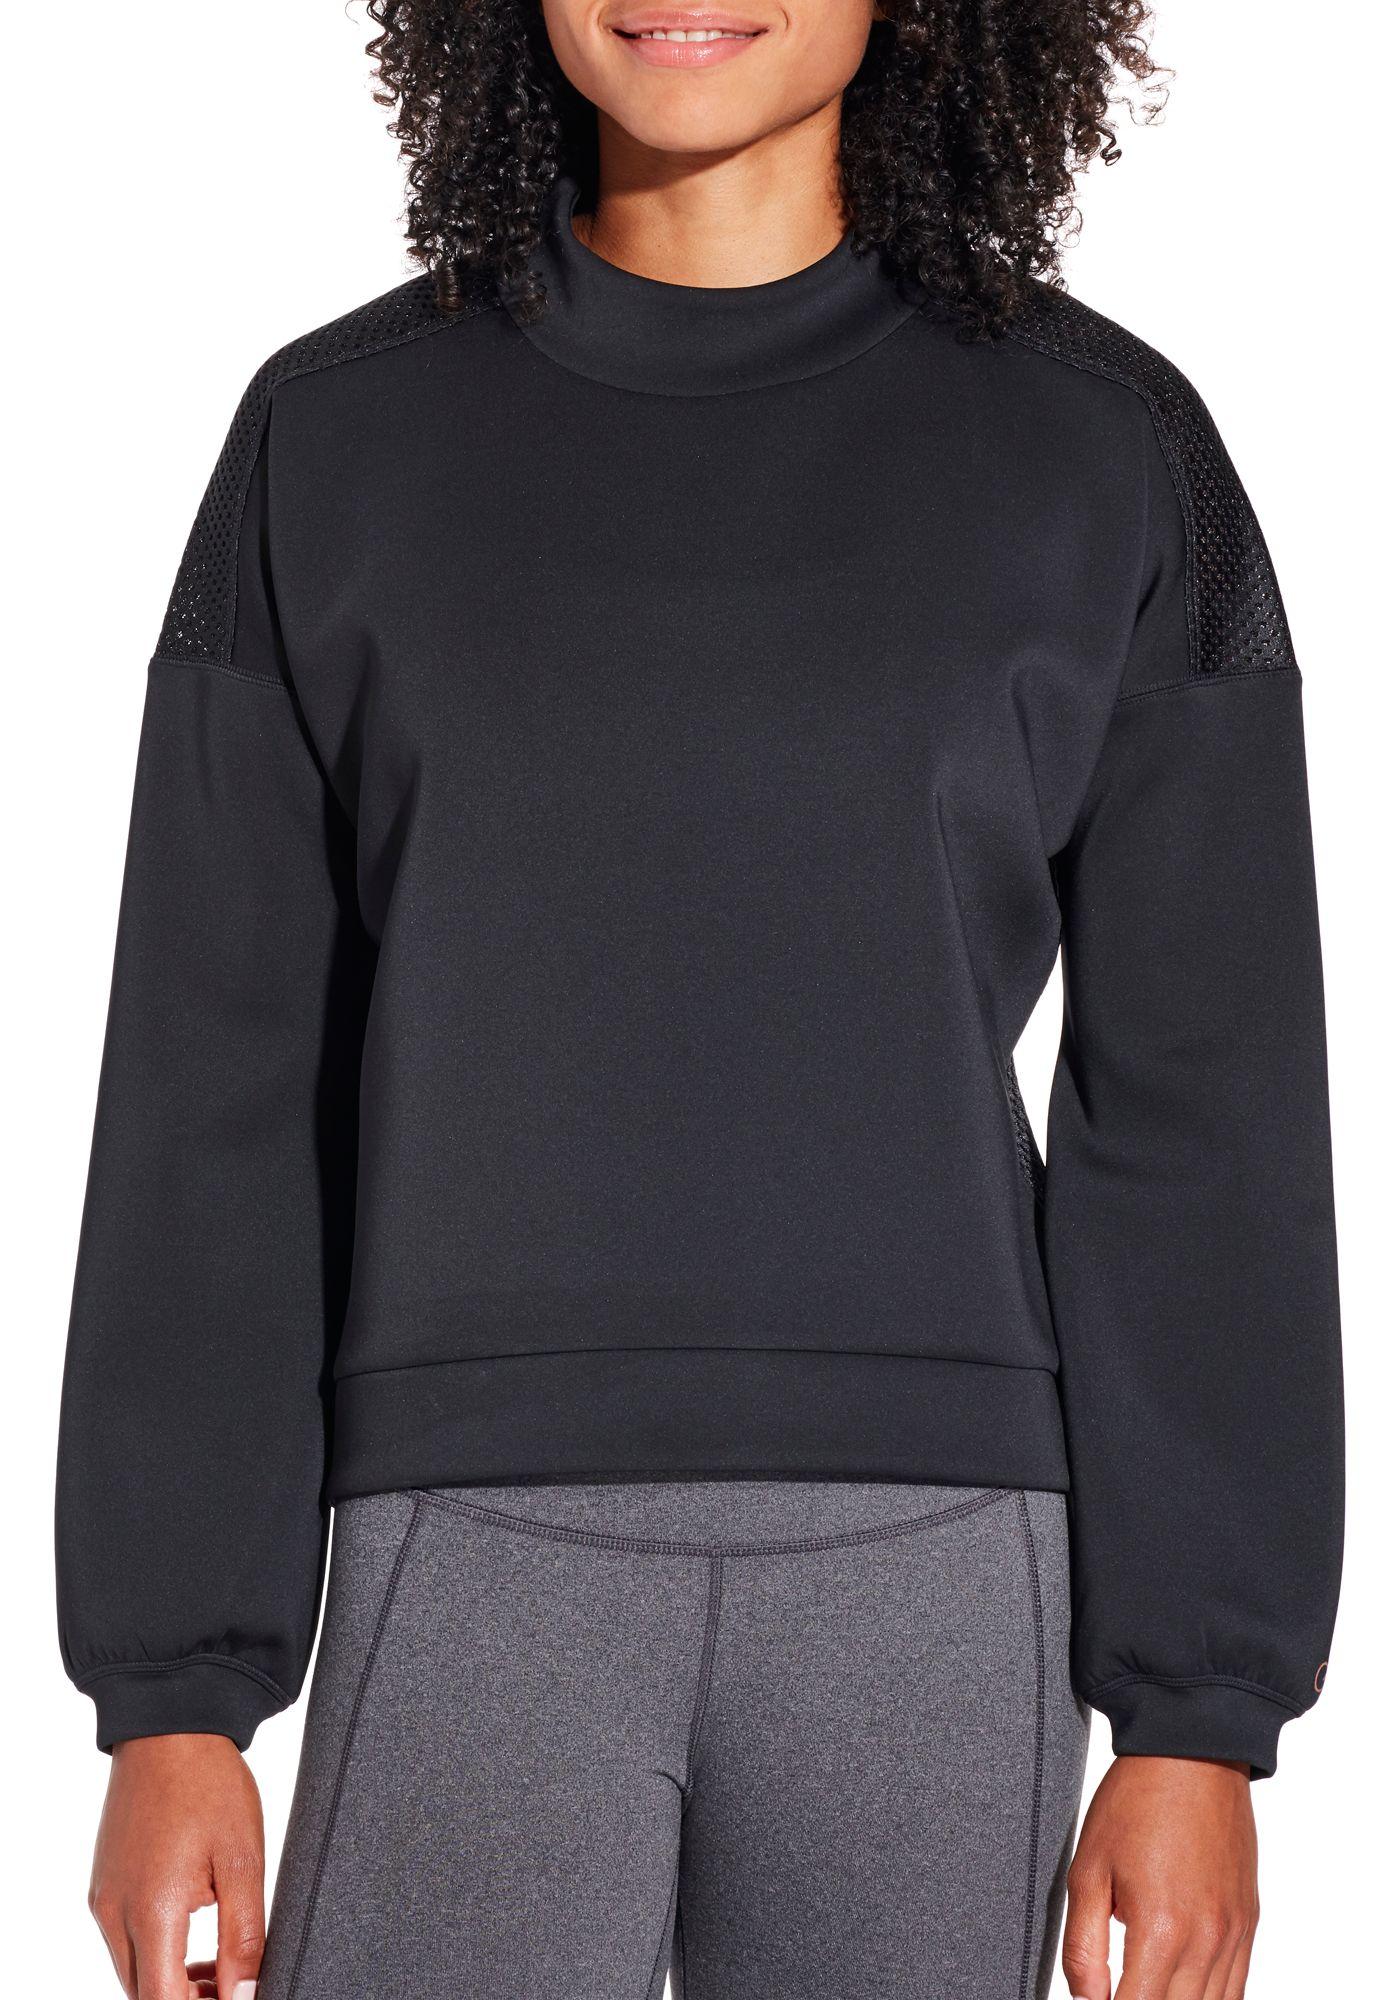 CALIA by Carrie Underwood Women's Mesh Back Pullover Sweatshirt